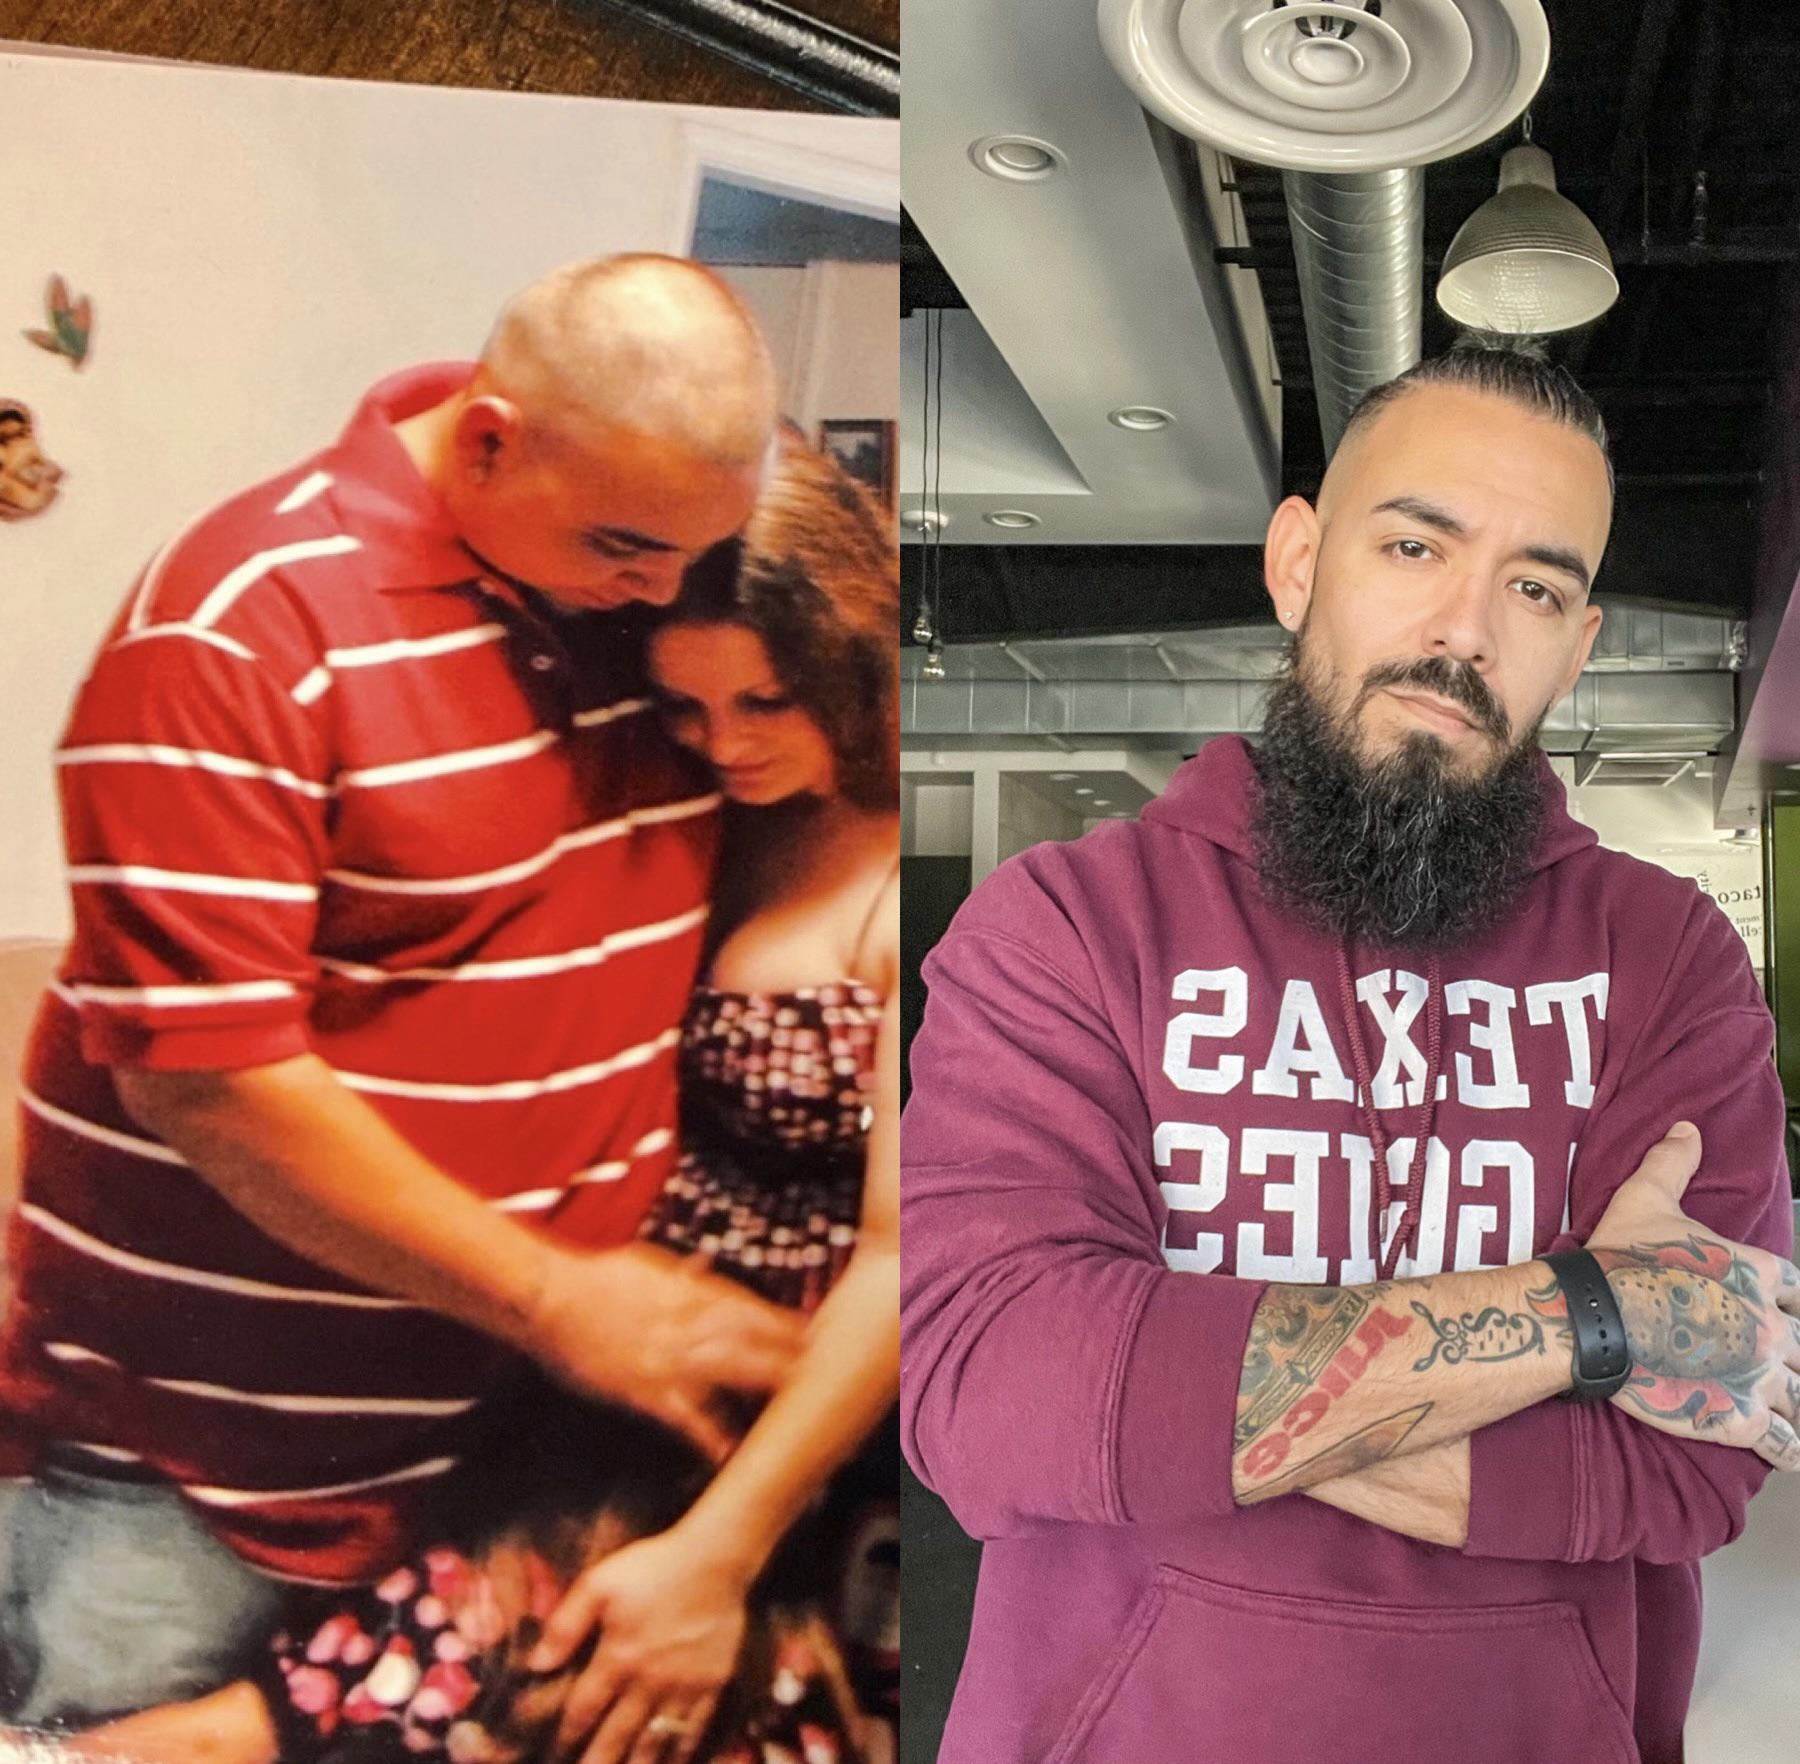 Progress Pics of 91 lbs Weight Loss 5 feet 11 Male 270 lbs to 179 lbs